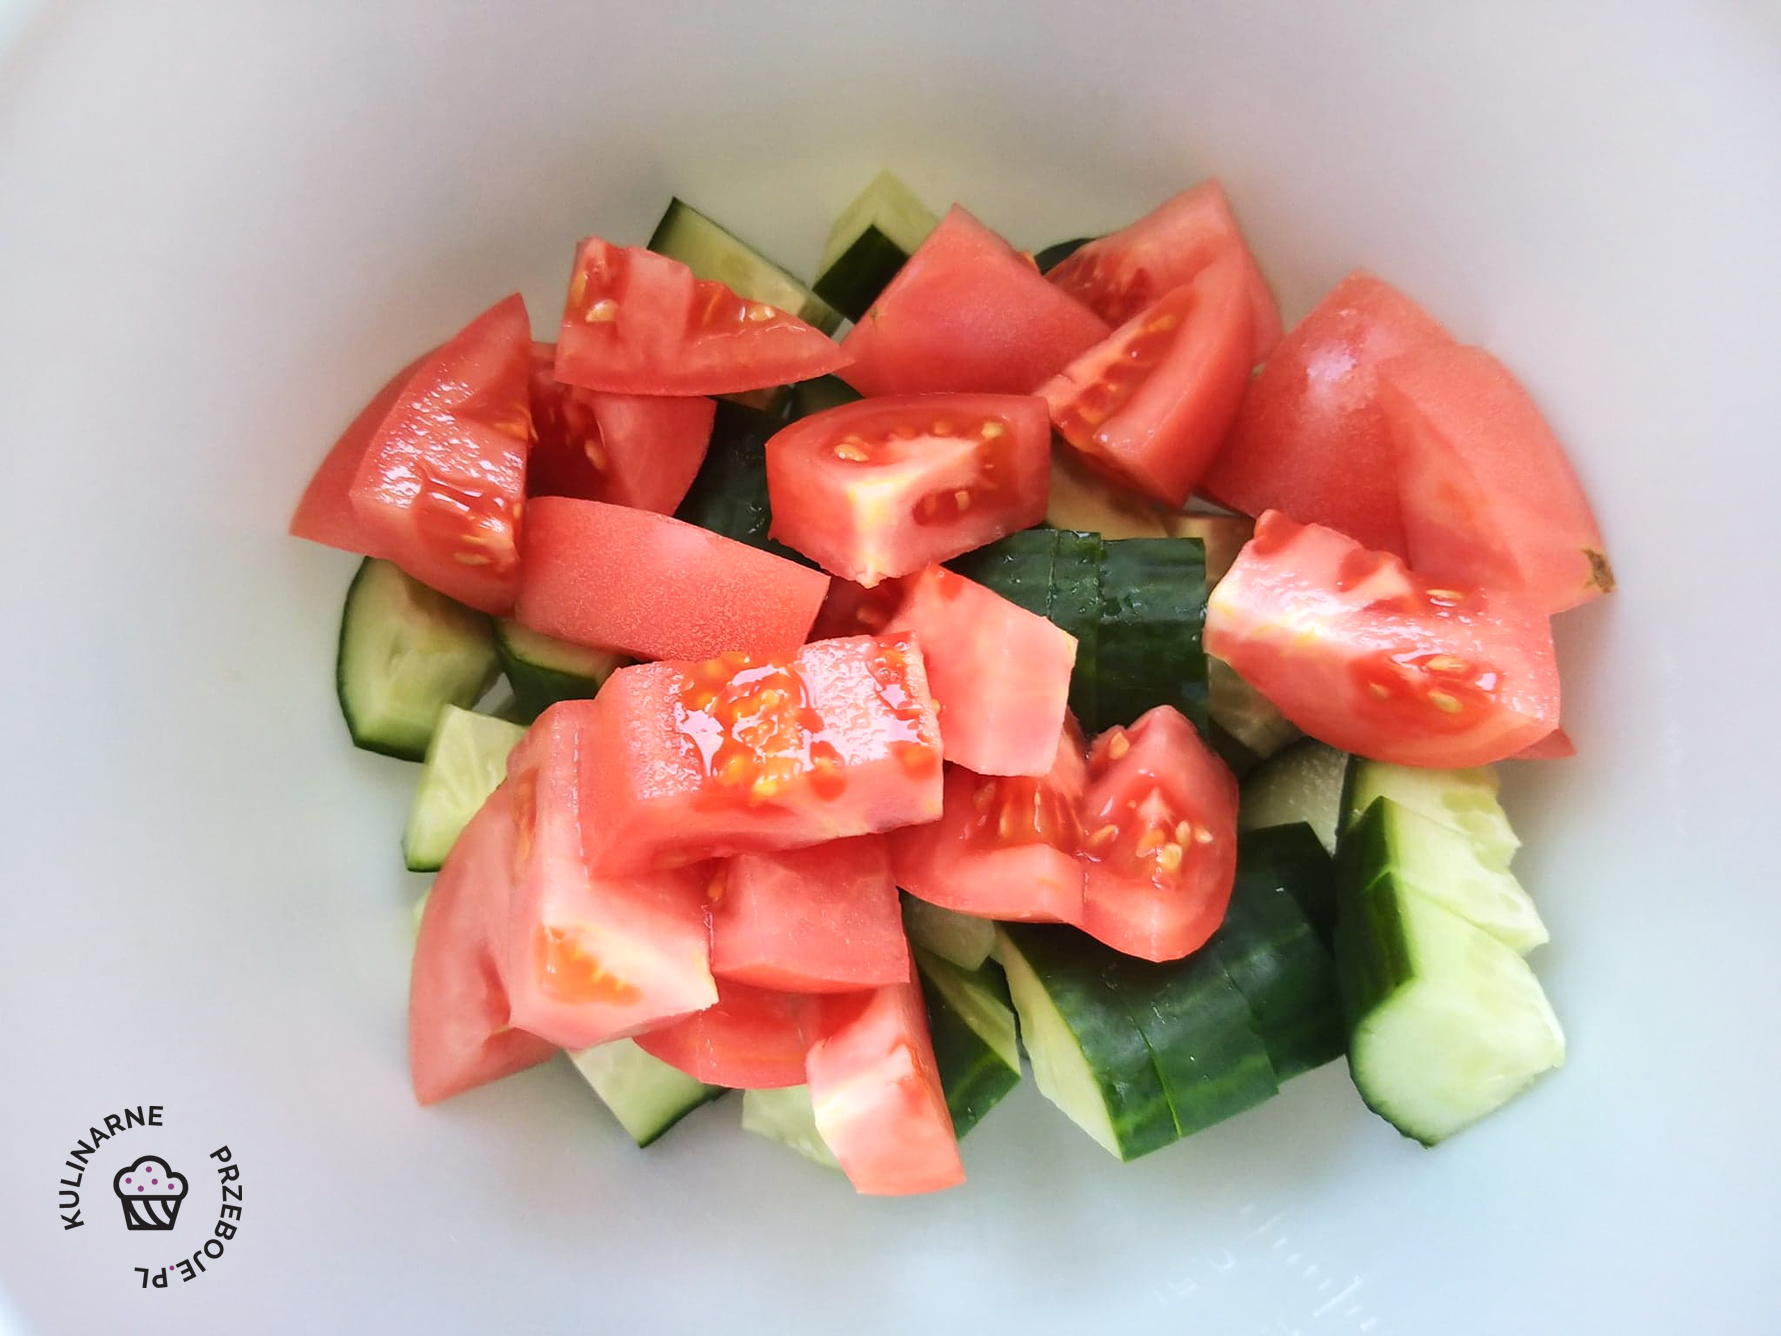 pomidor ogórek